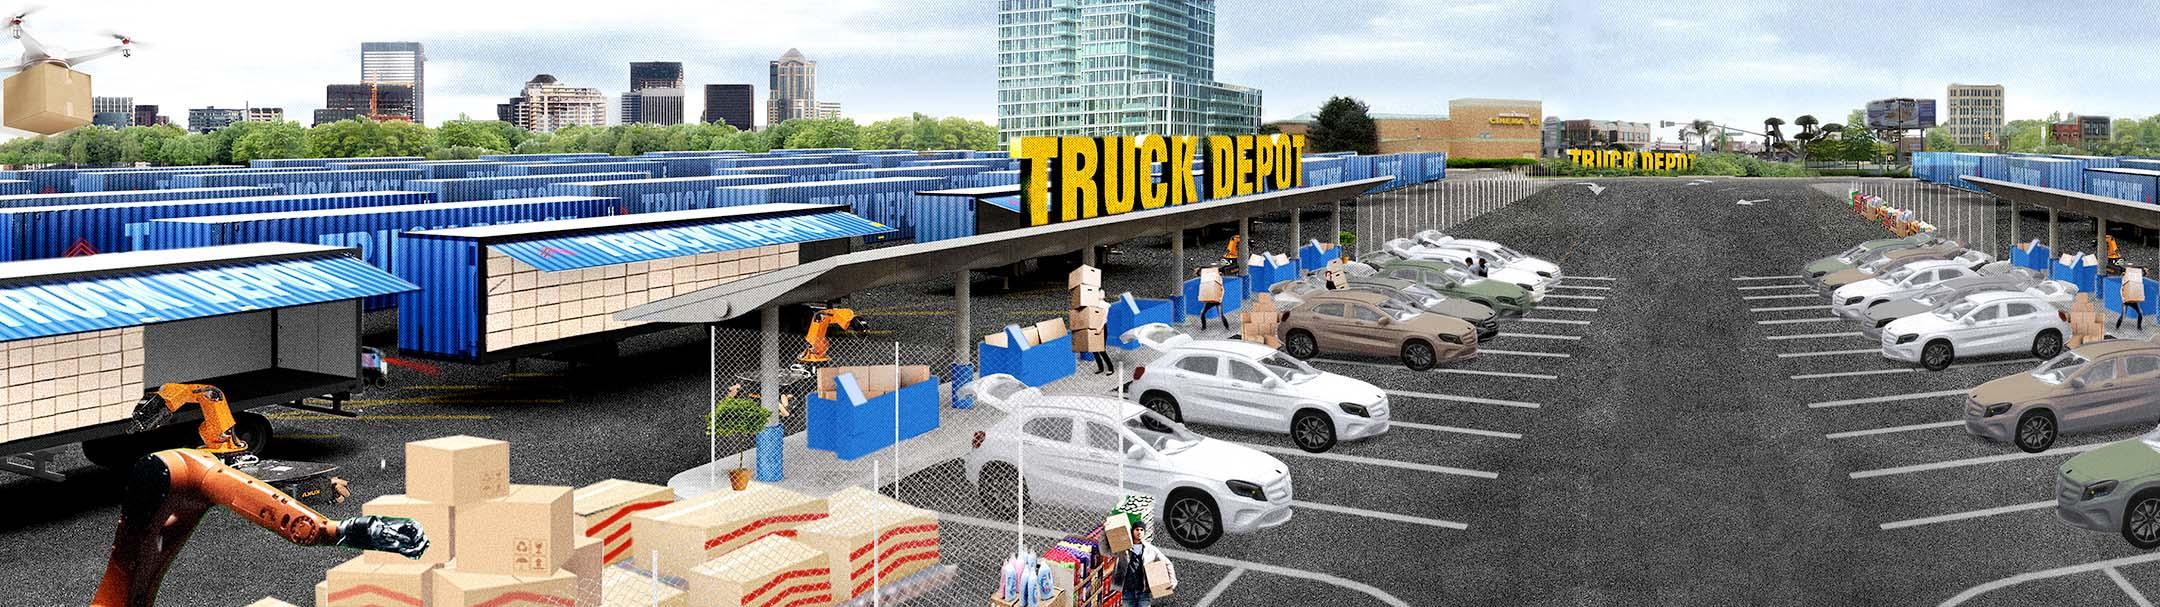 Rendering of a truck depot